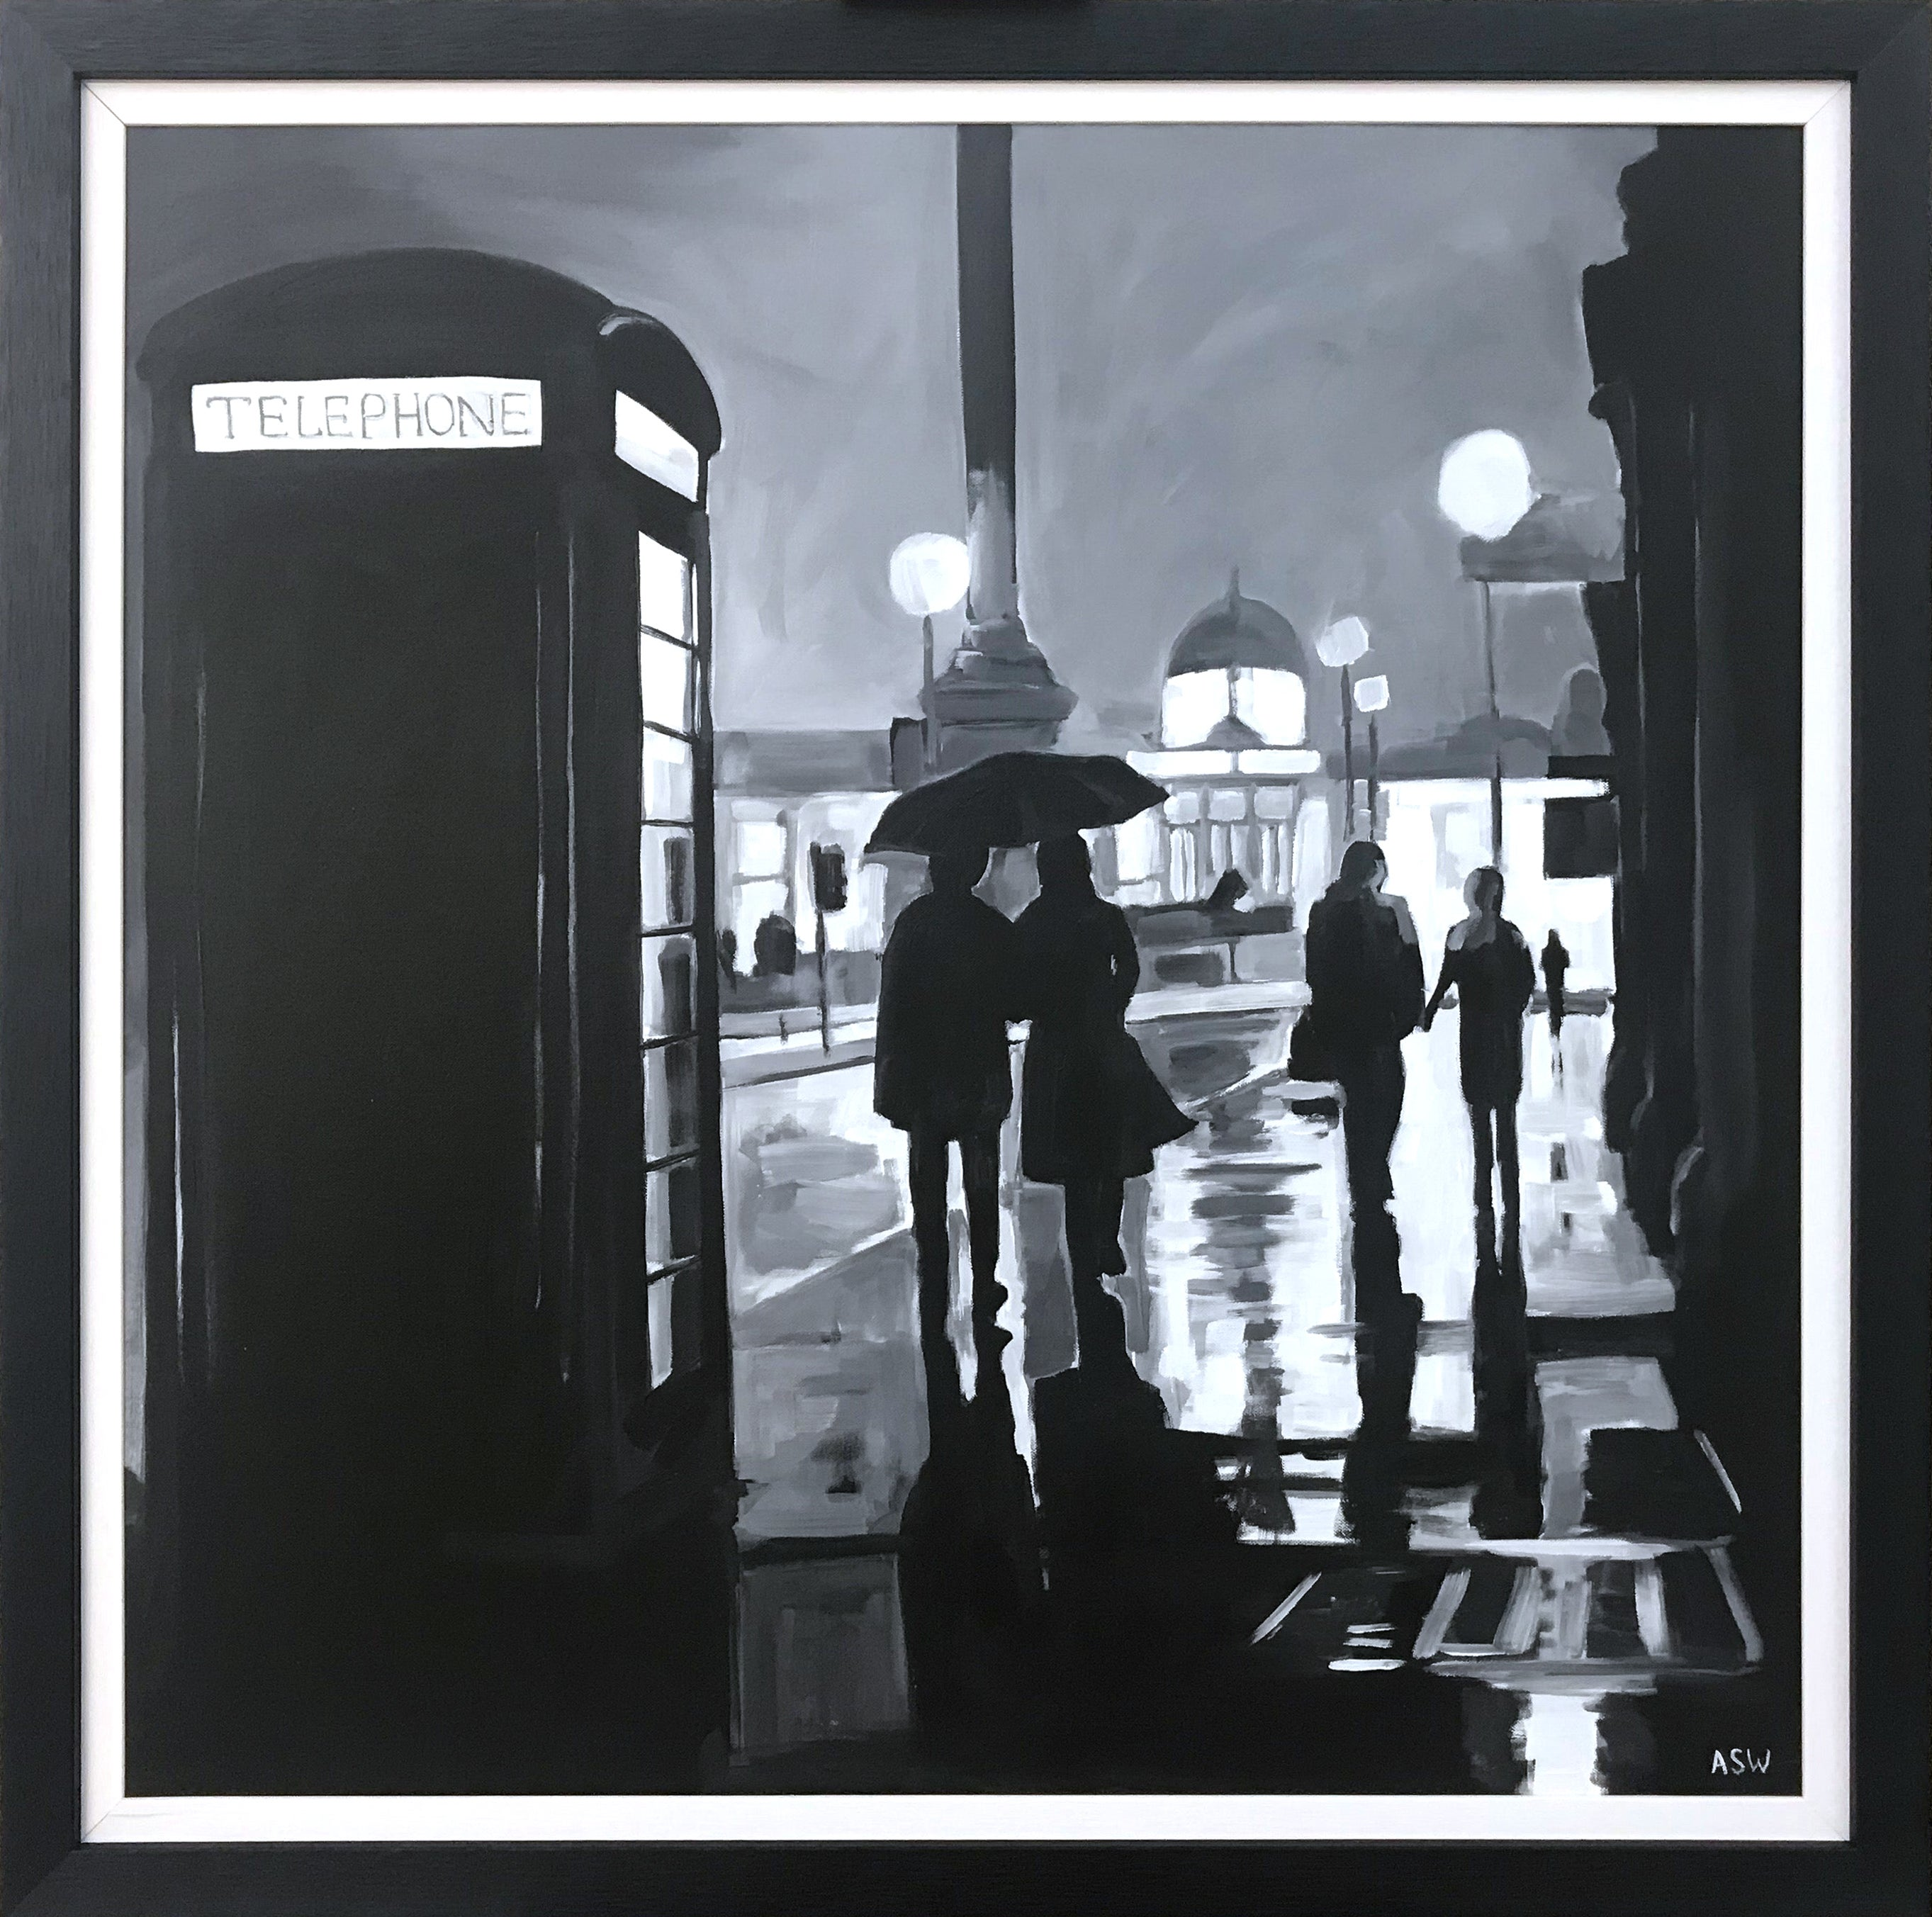 Painting of Trafalgar Square Rain London City by British Urban Landscape Artist